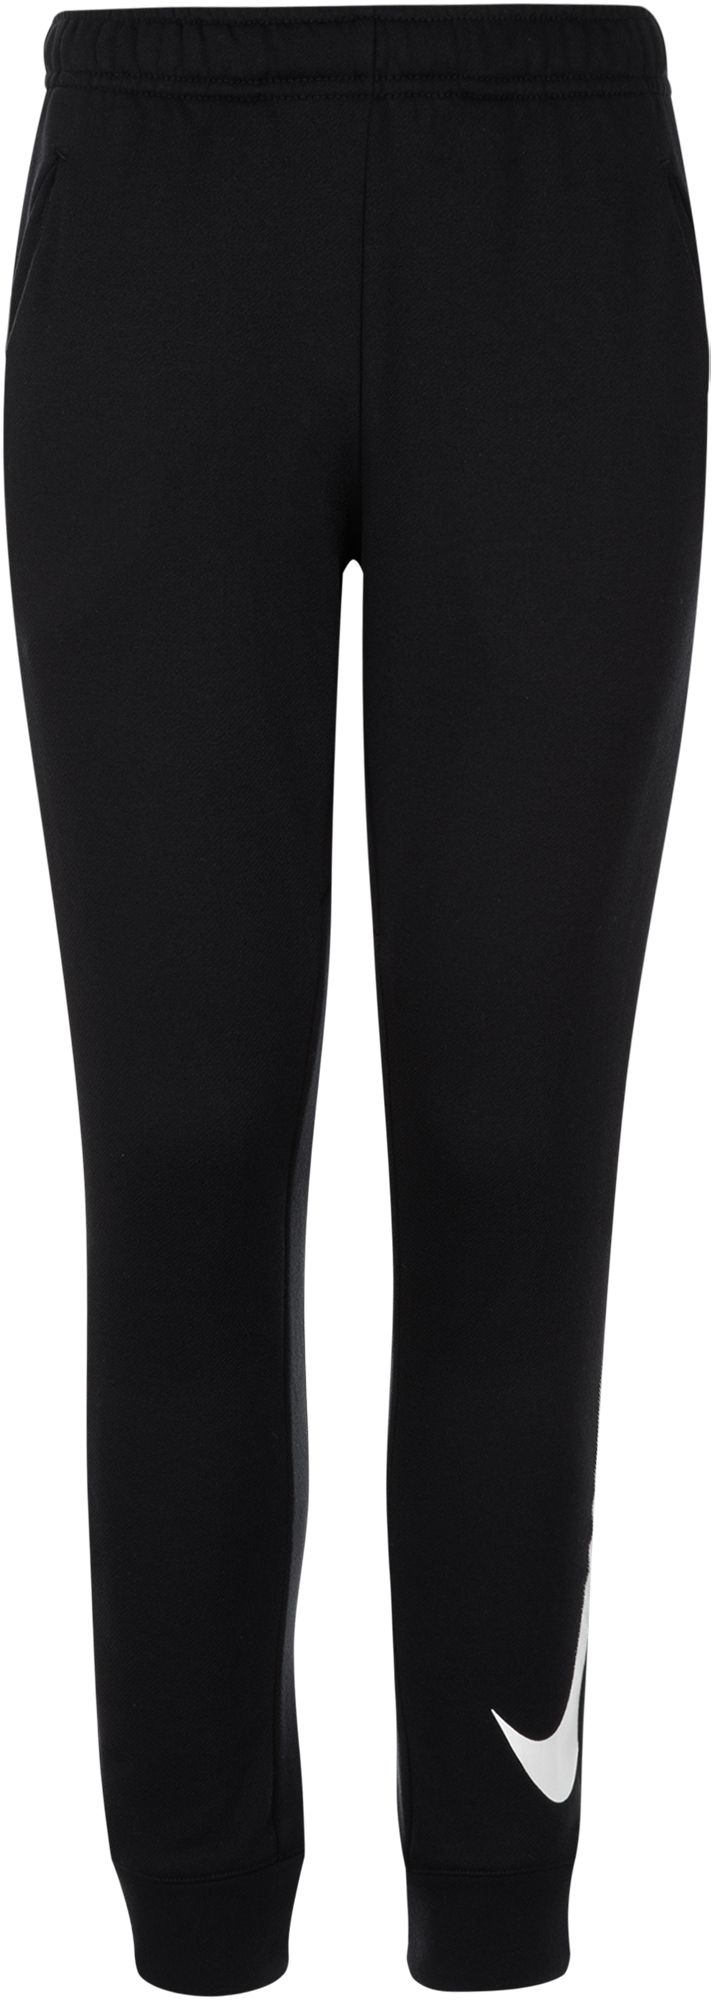 Nike Брюки для мальчиков Nike Dri-FIT, размер 158-170 одежда для занятий баскетболом nike 005027 11 diy